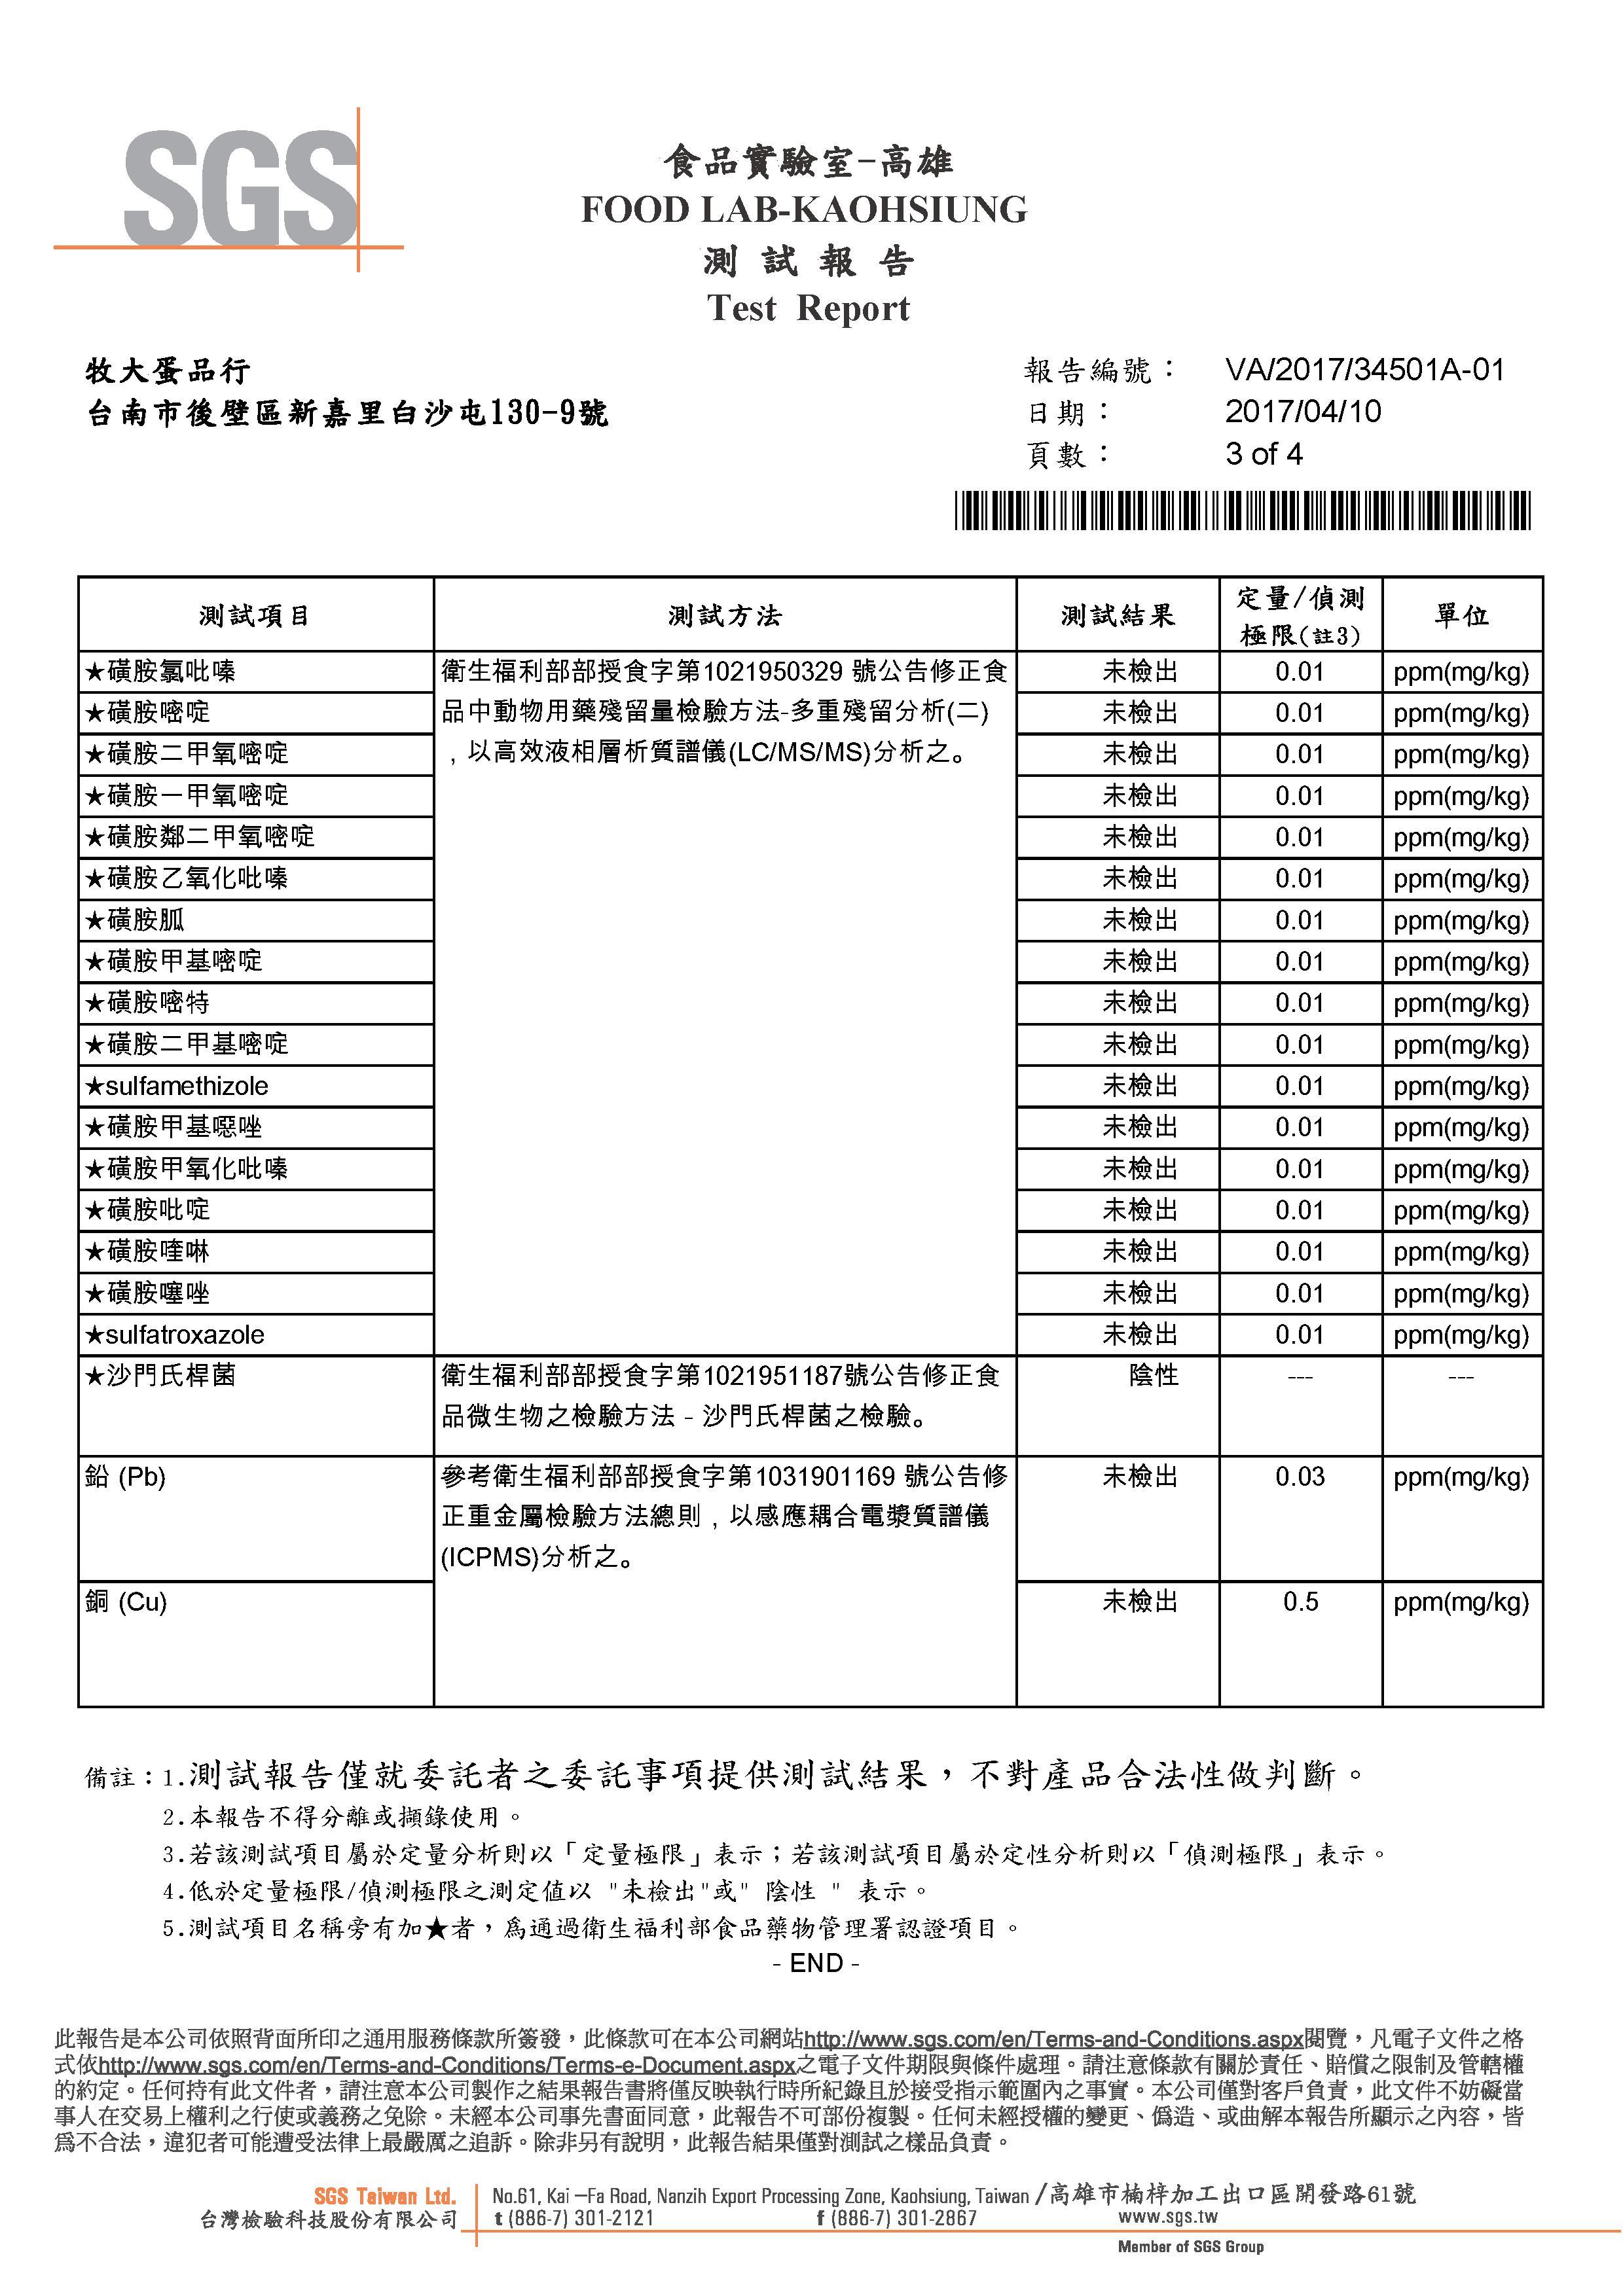 0339bf2c-825c-4928-847e-ed150f7d1202.jpg